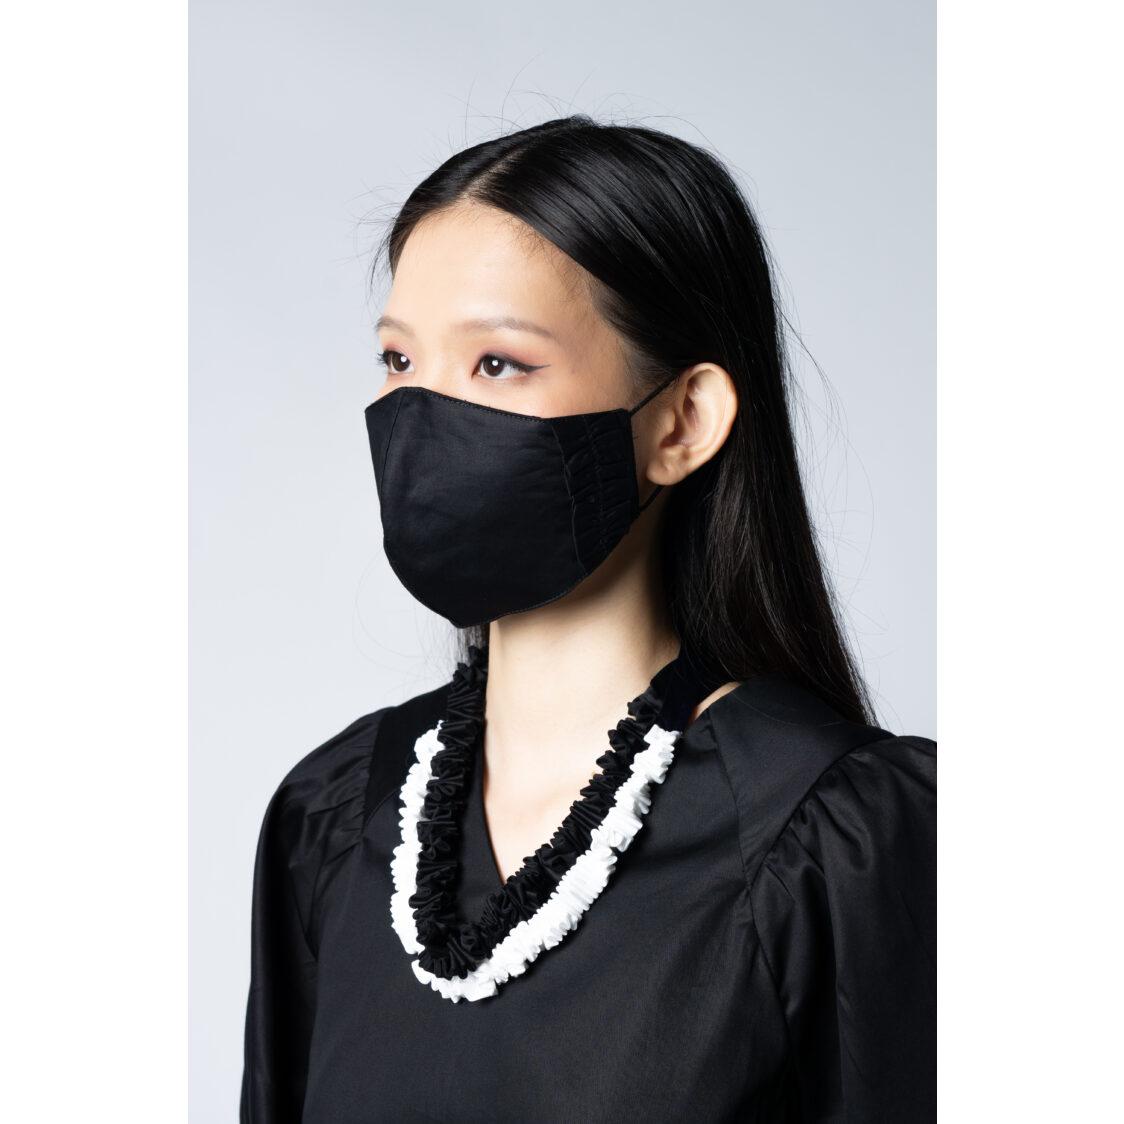 Kurt Woods Ruffles Face Mask Black Kw7487fm-r2 Free Size